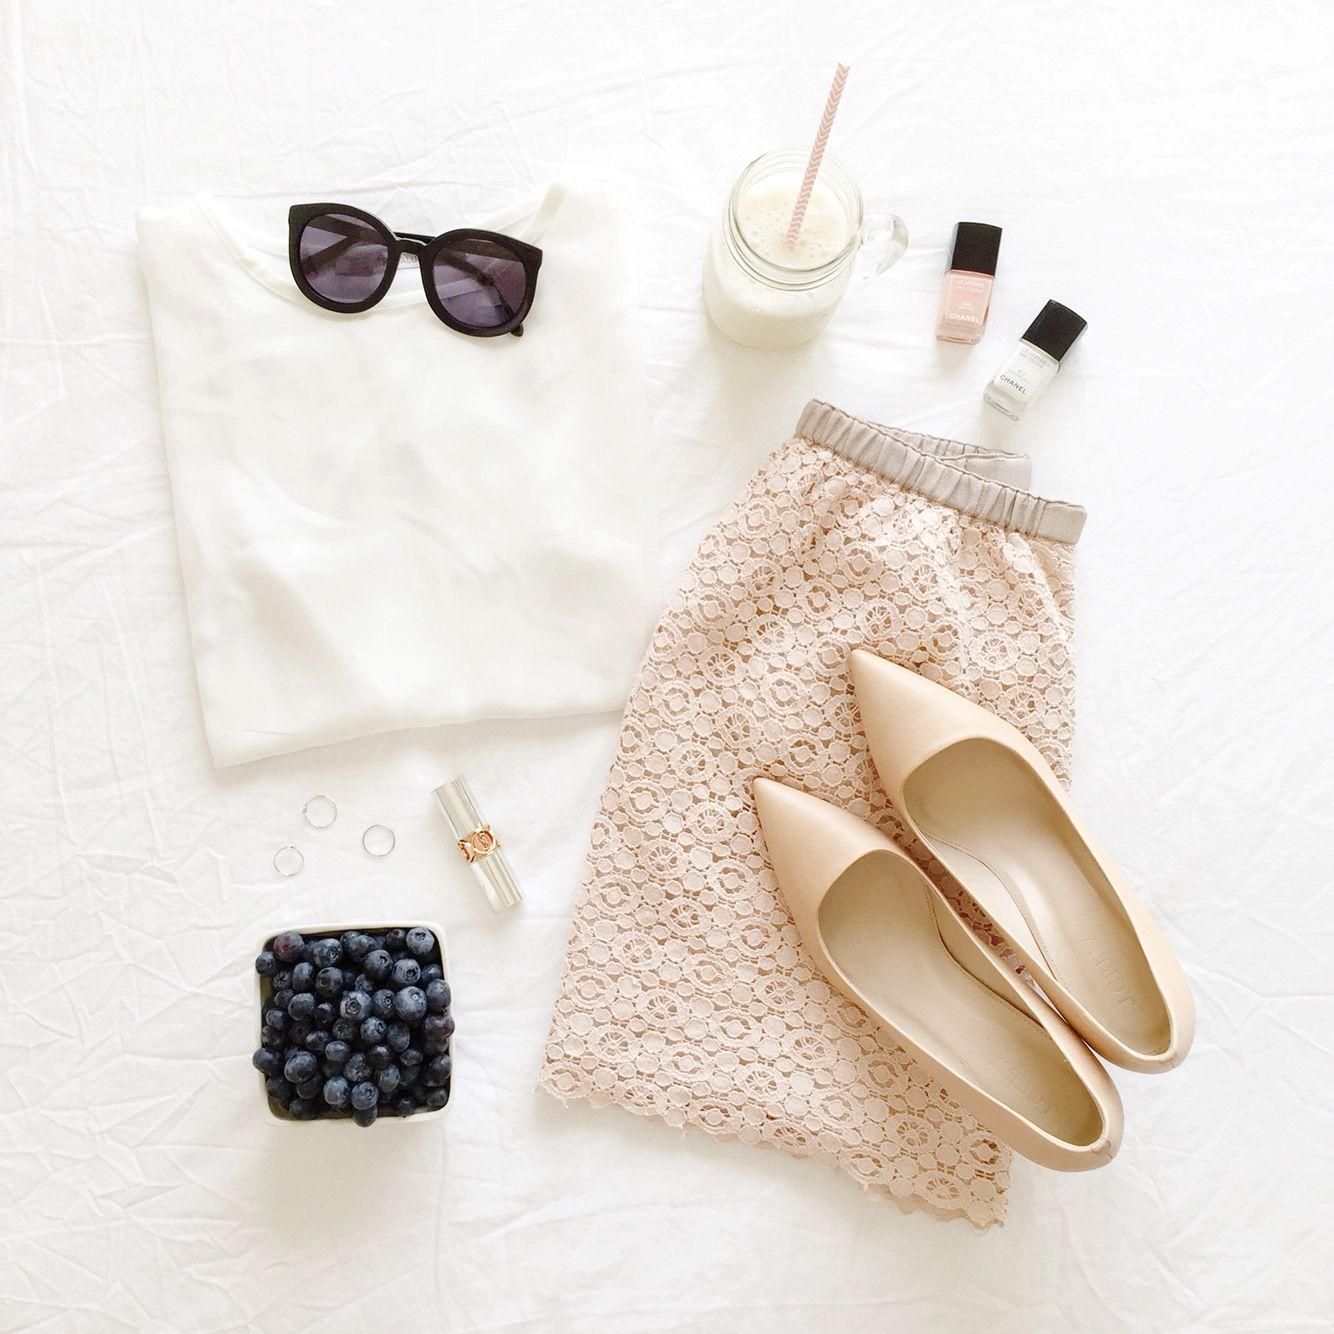 lace skirt (via @thepinkdiary)